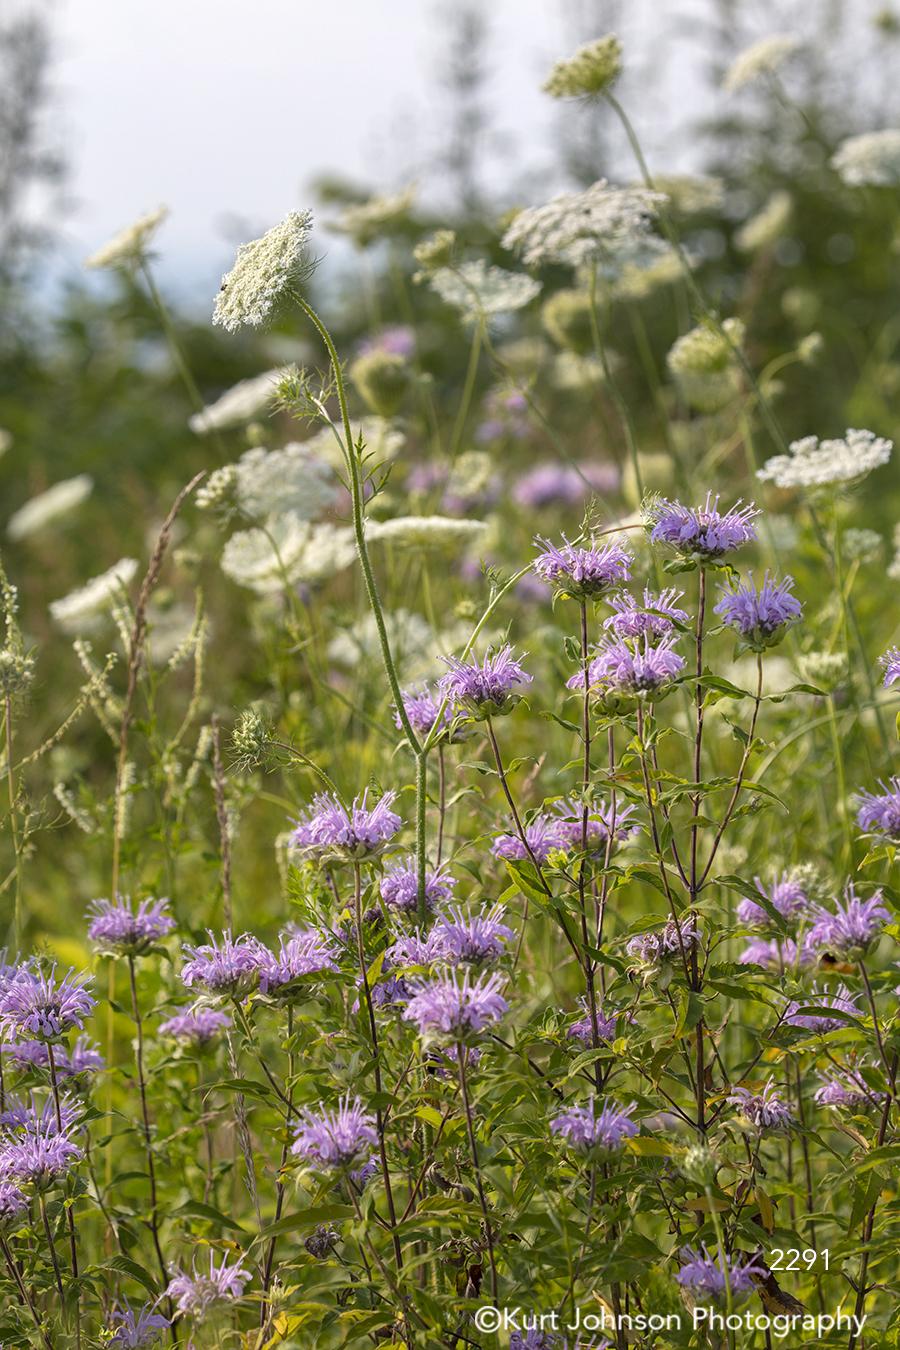 purple white flower flowers wildflowers green grass grasses field